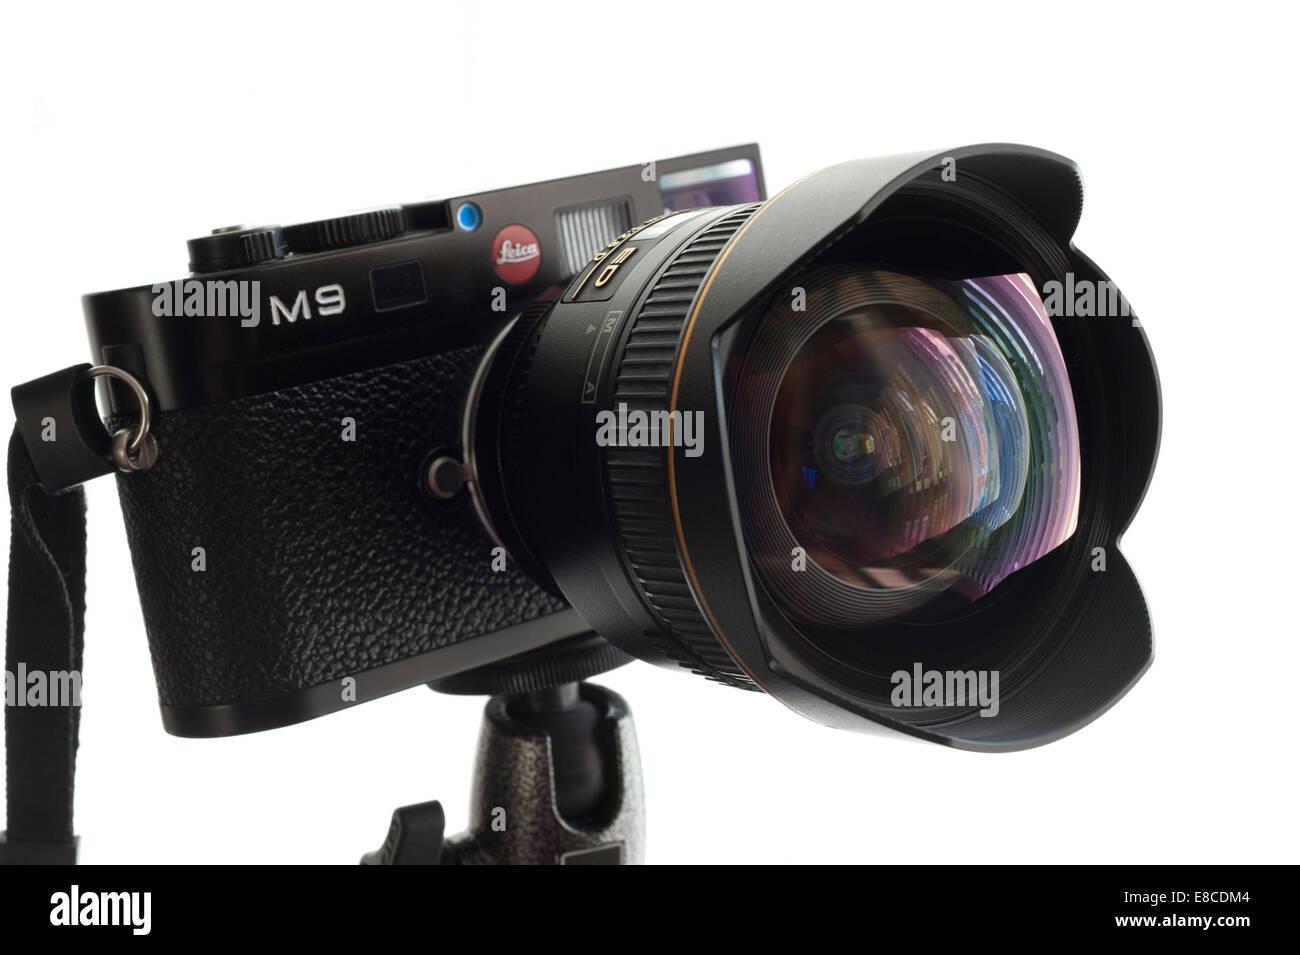 Digitaler Entfernungsmesser Nikon : Leica m digitale messsucherkamera mit nikon mm objektiv